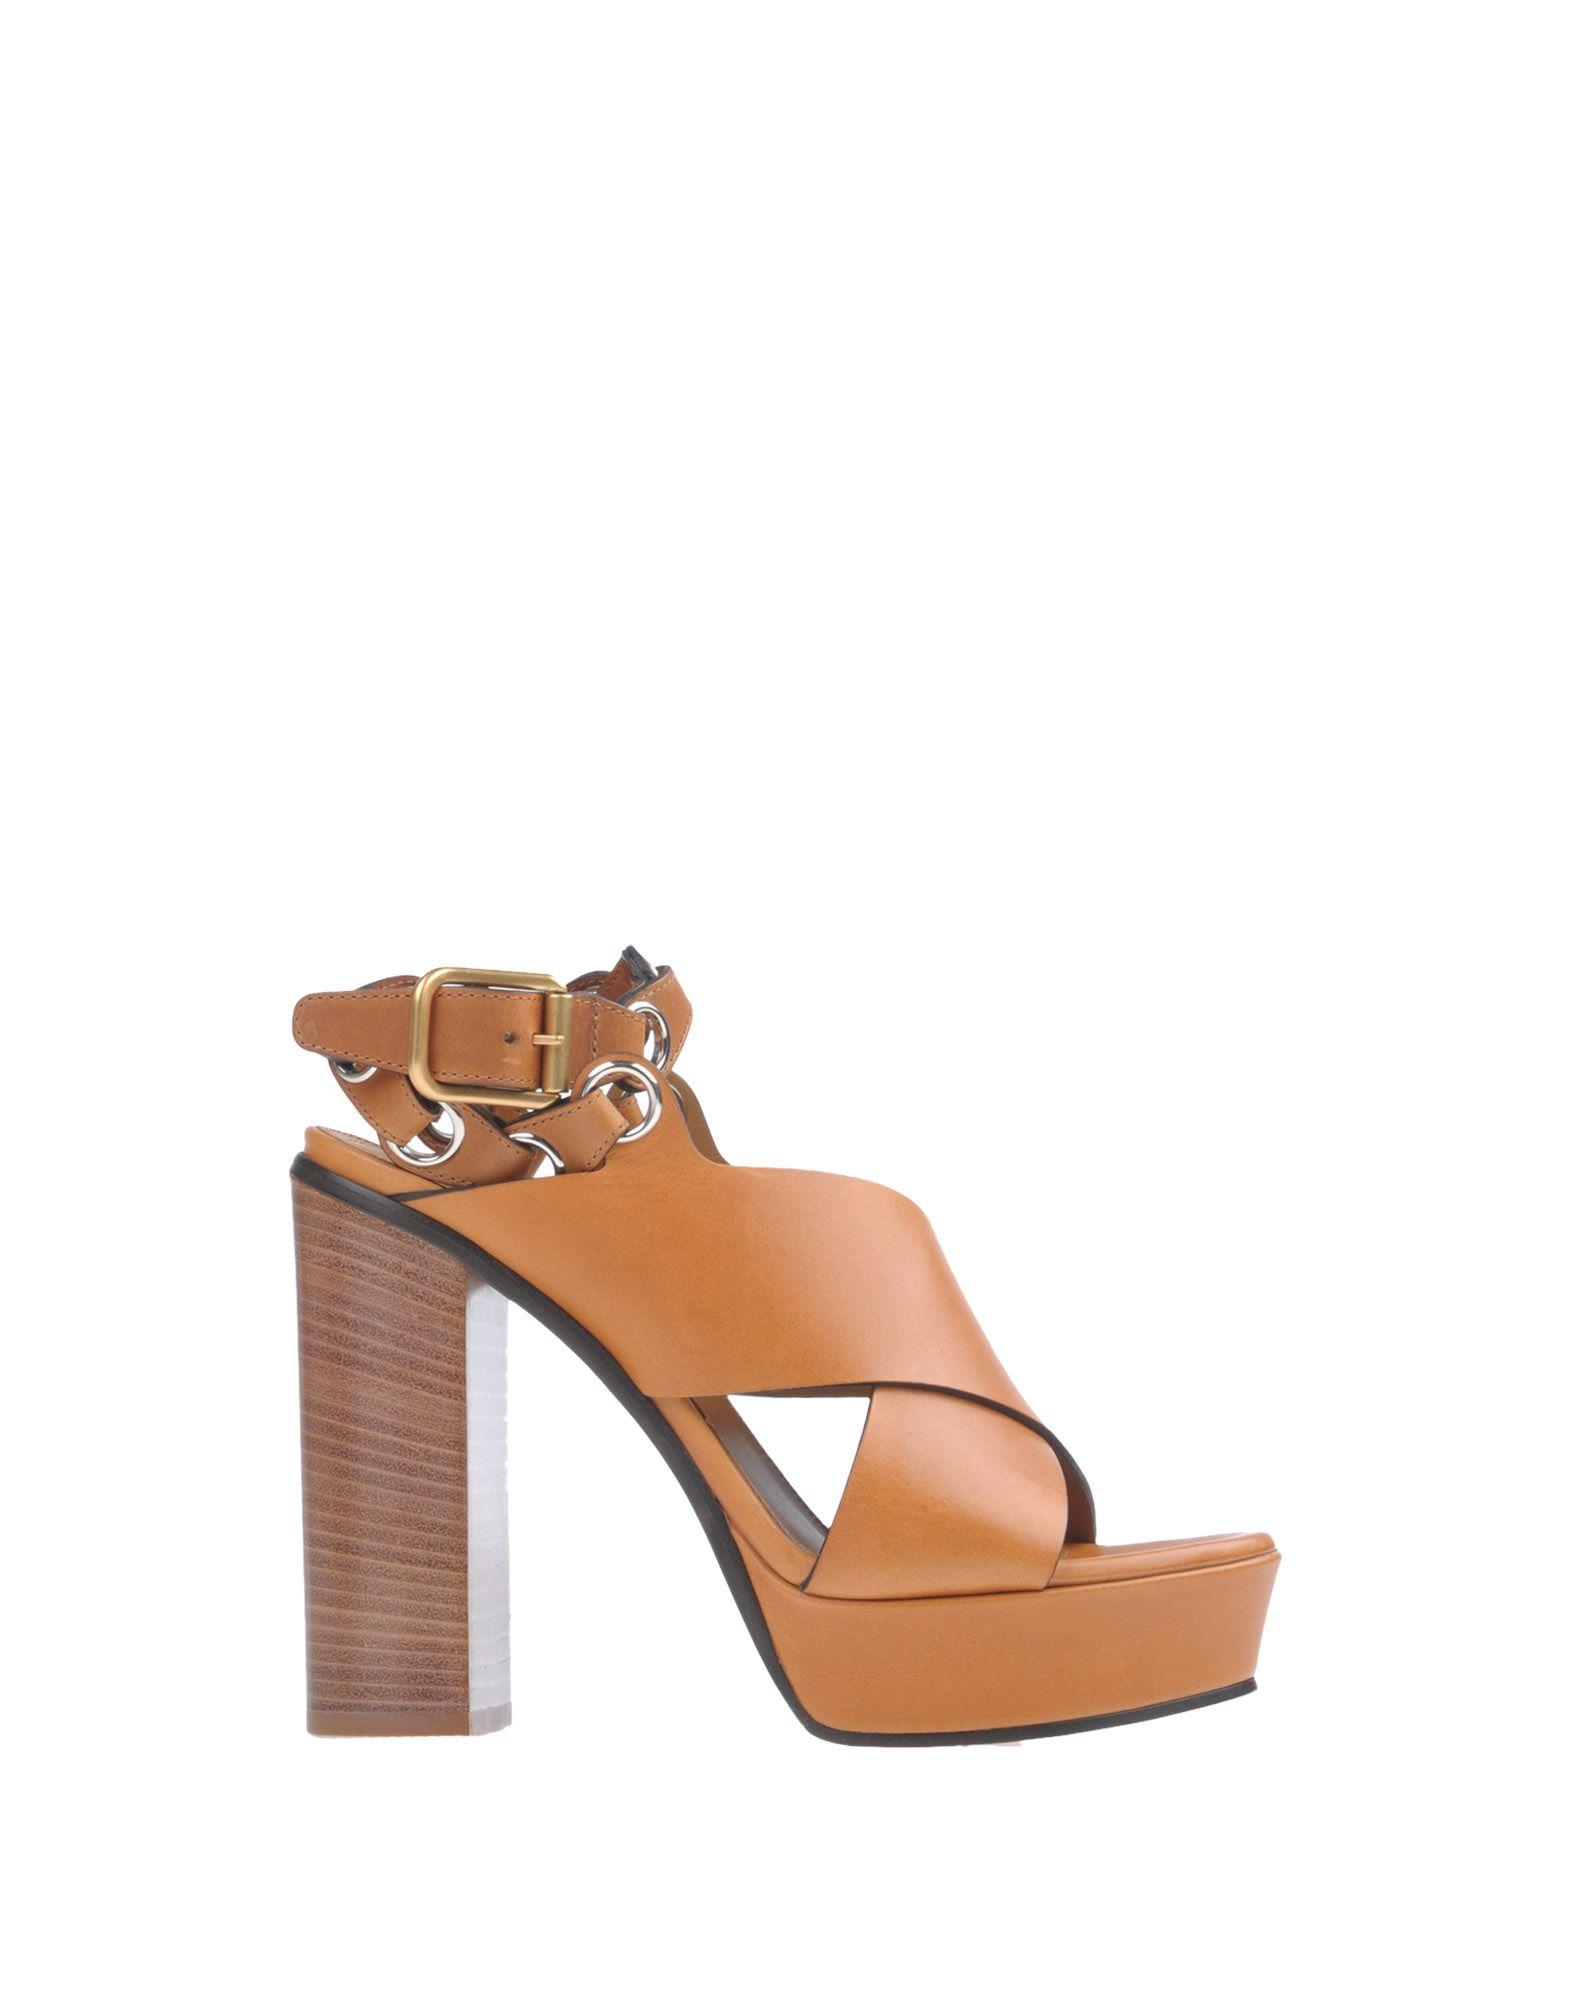 Haltbare Mode billige Schuhe Chloé Sandalen Damen  11342763HV Heiße Schuhe